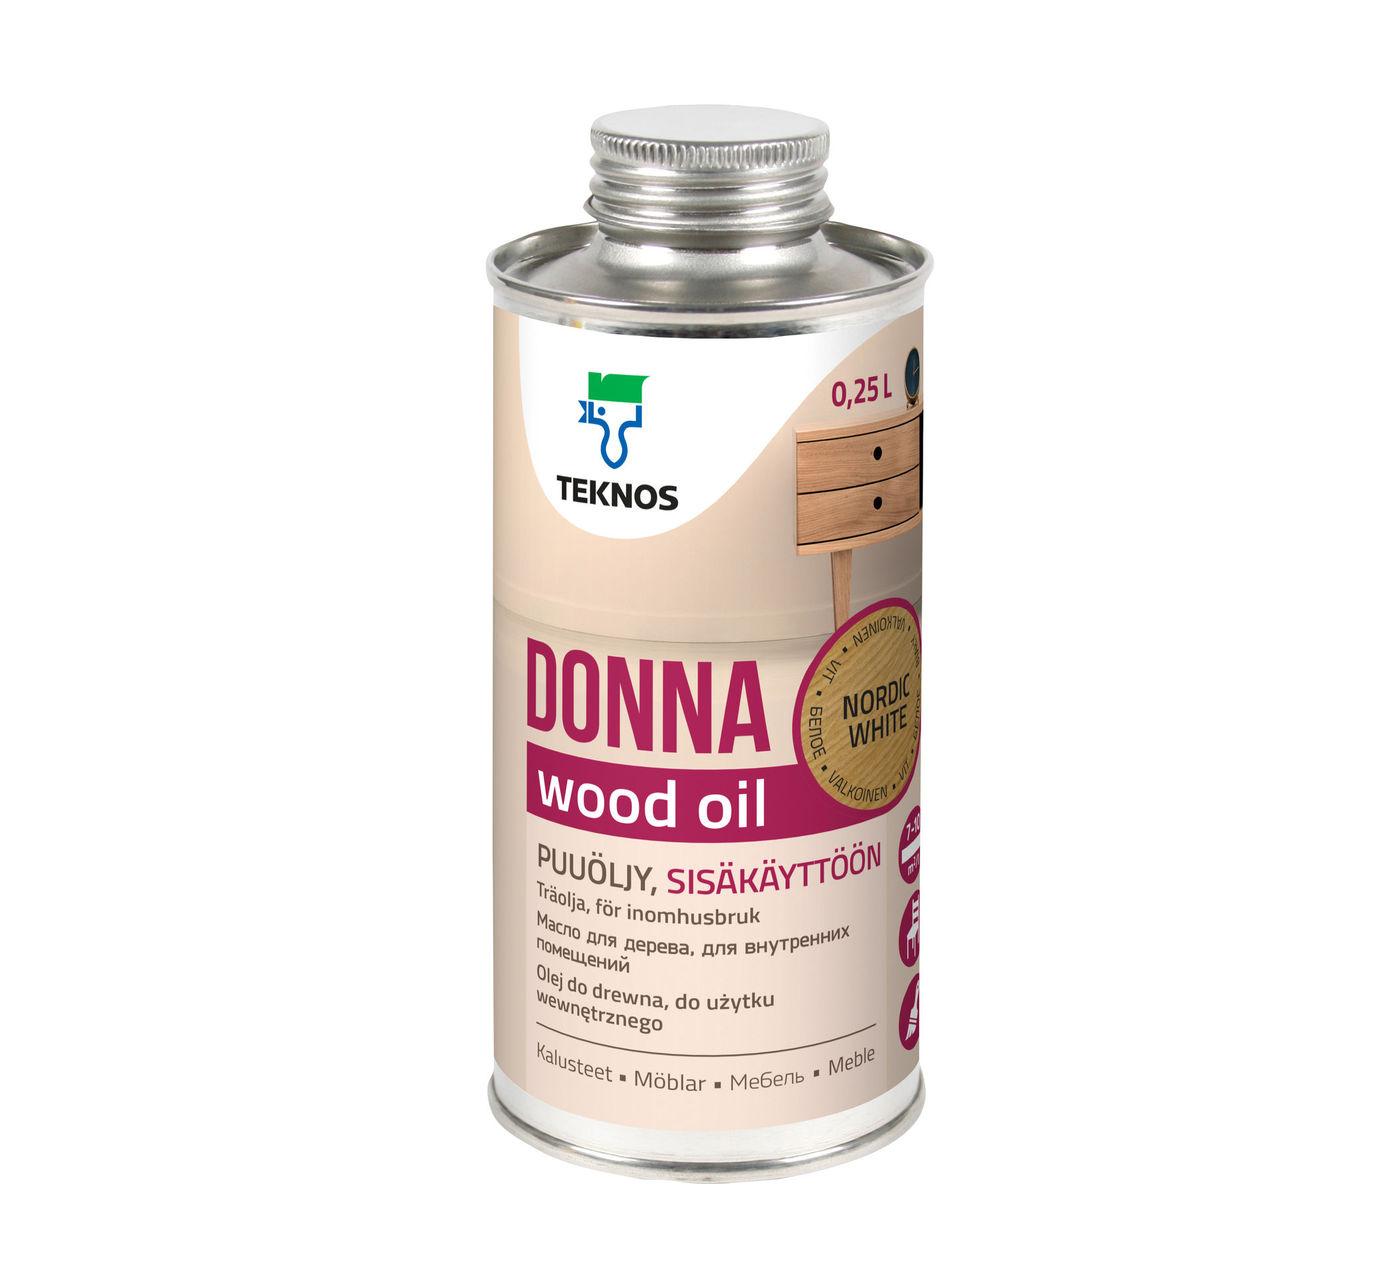 DONNA NORDIC WHITE масло для мебели